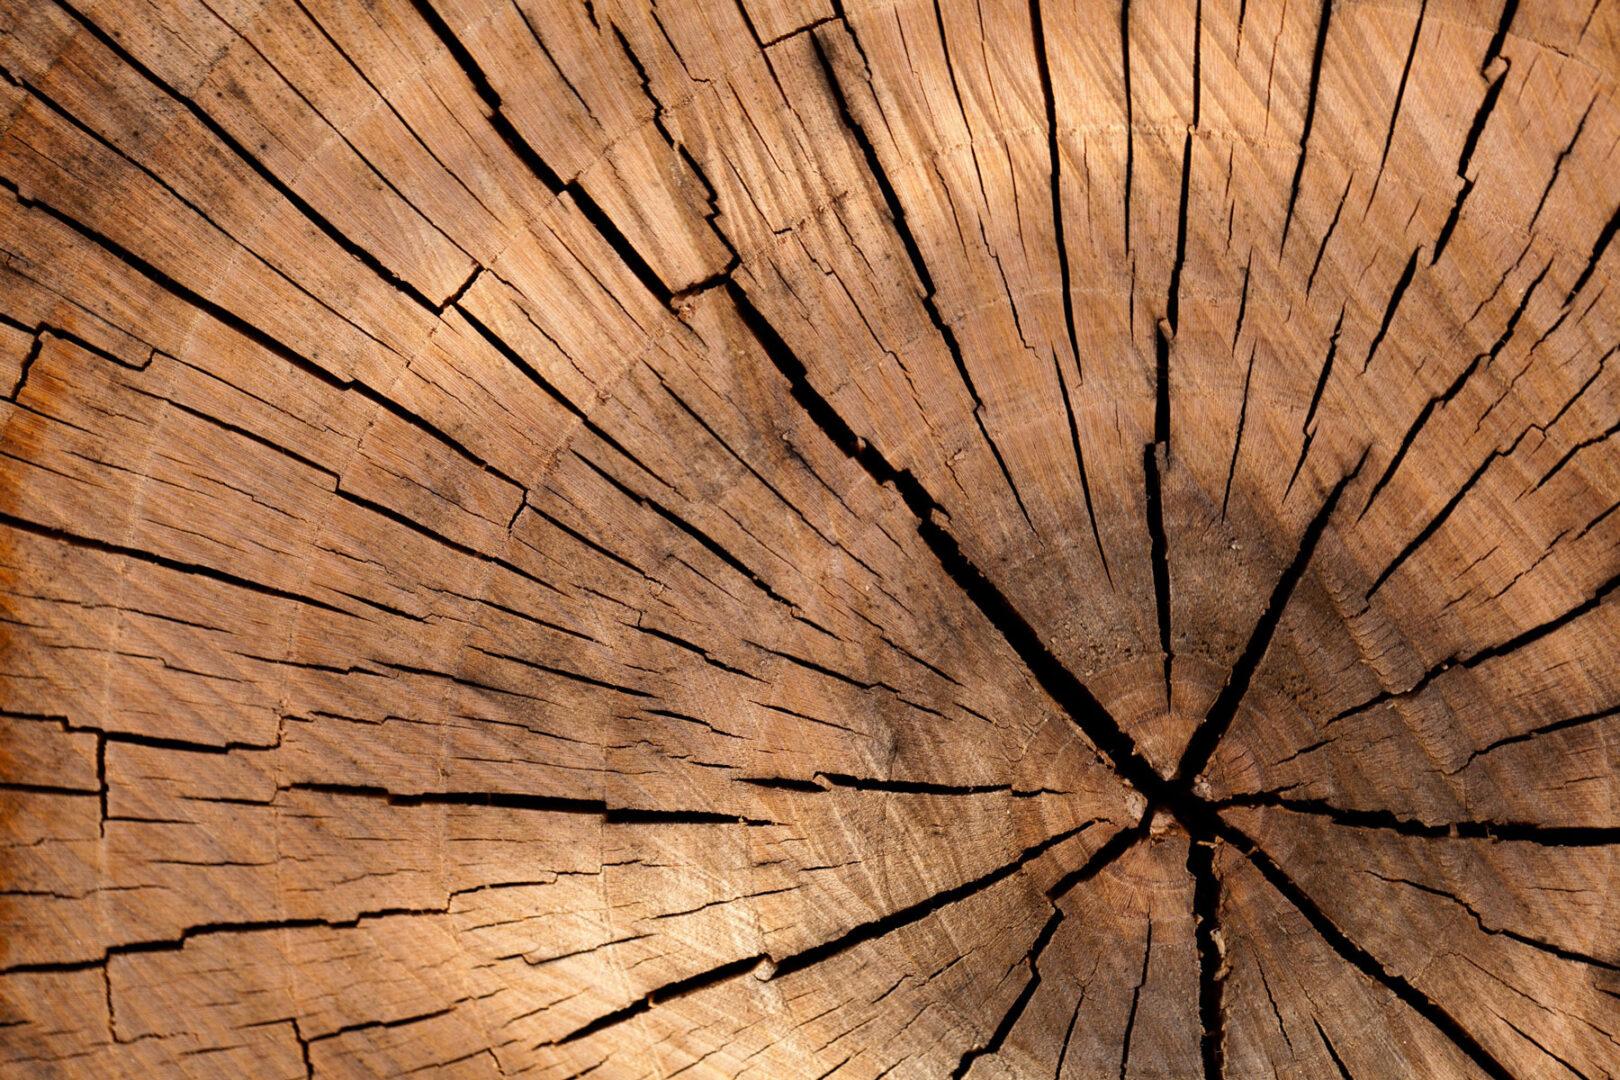 wood-nature-pattern-texture-40973_01